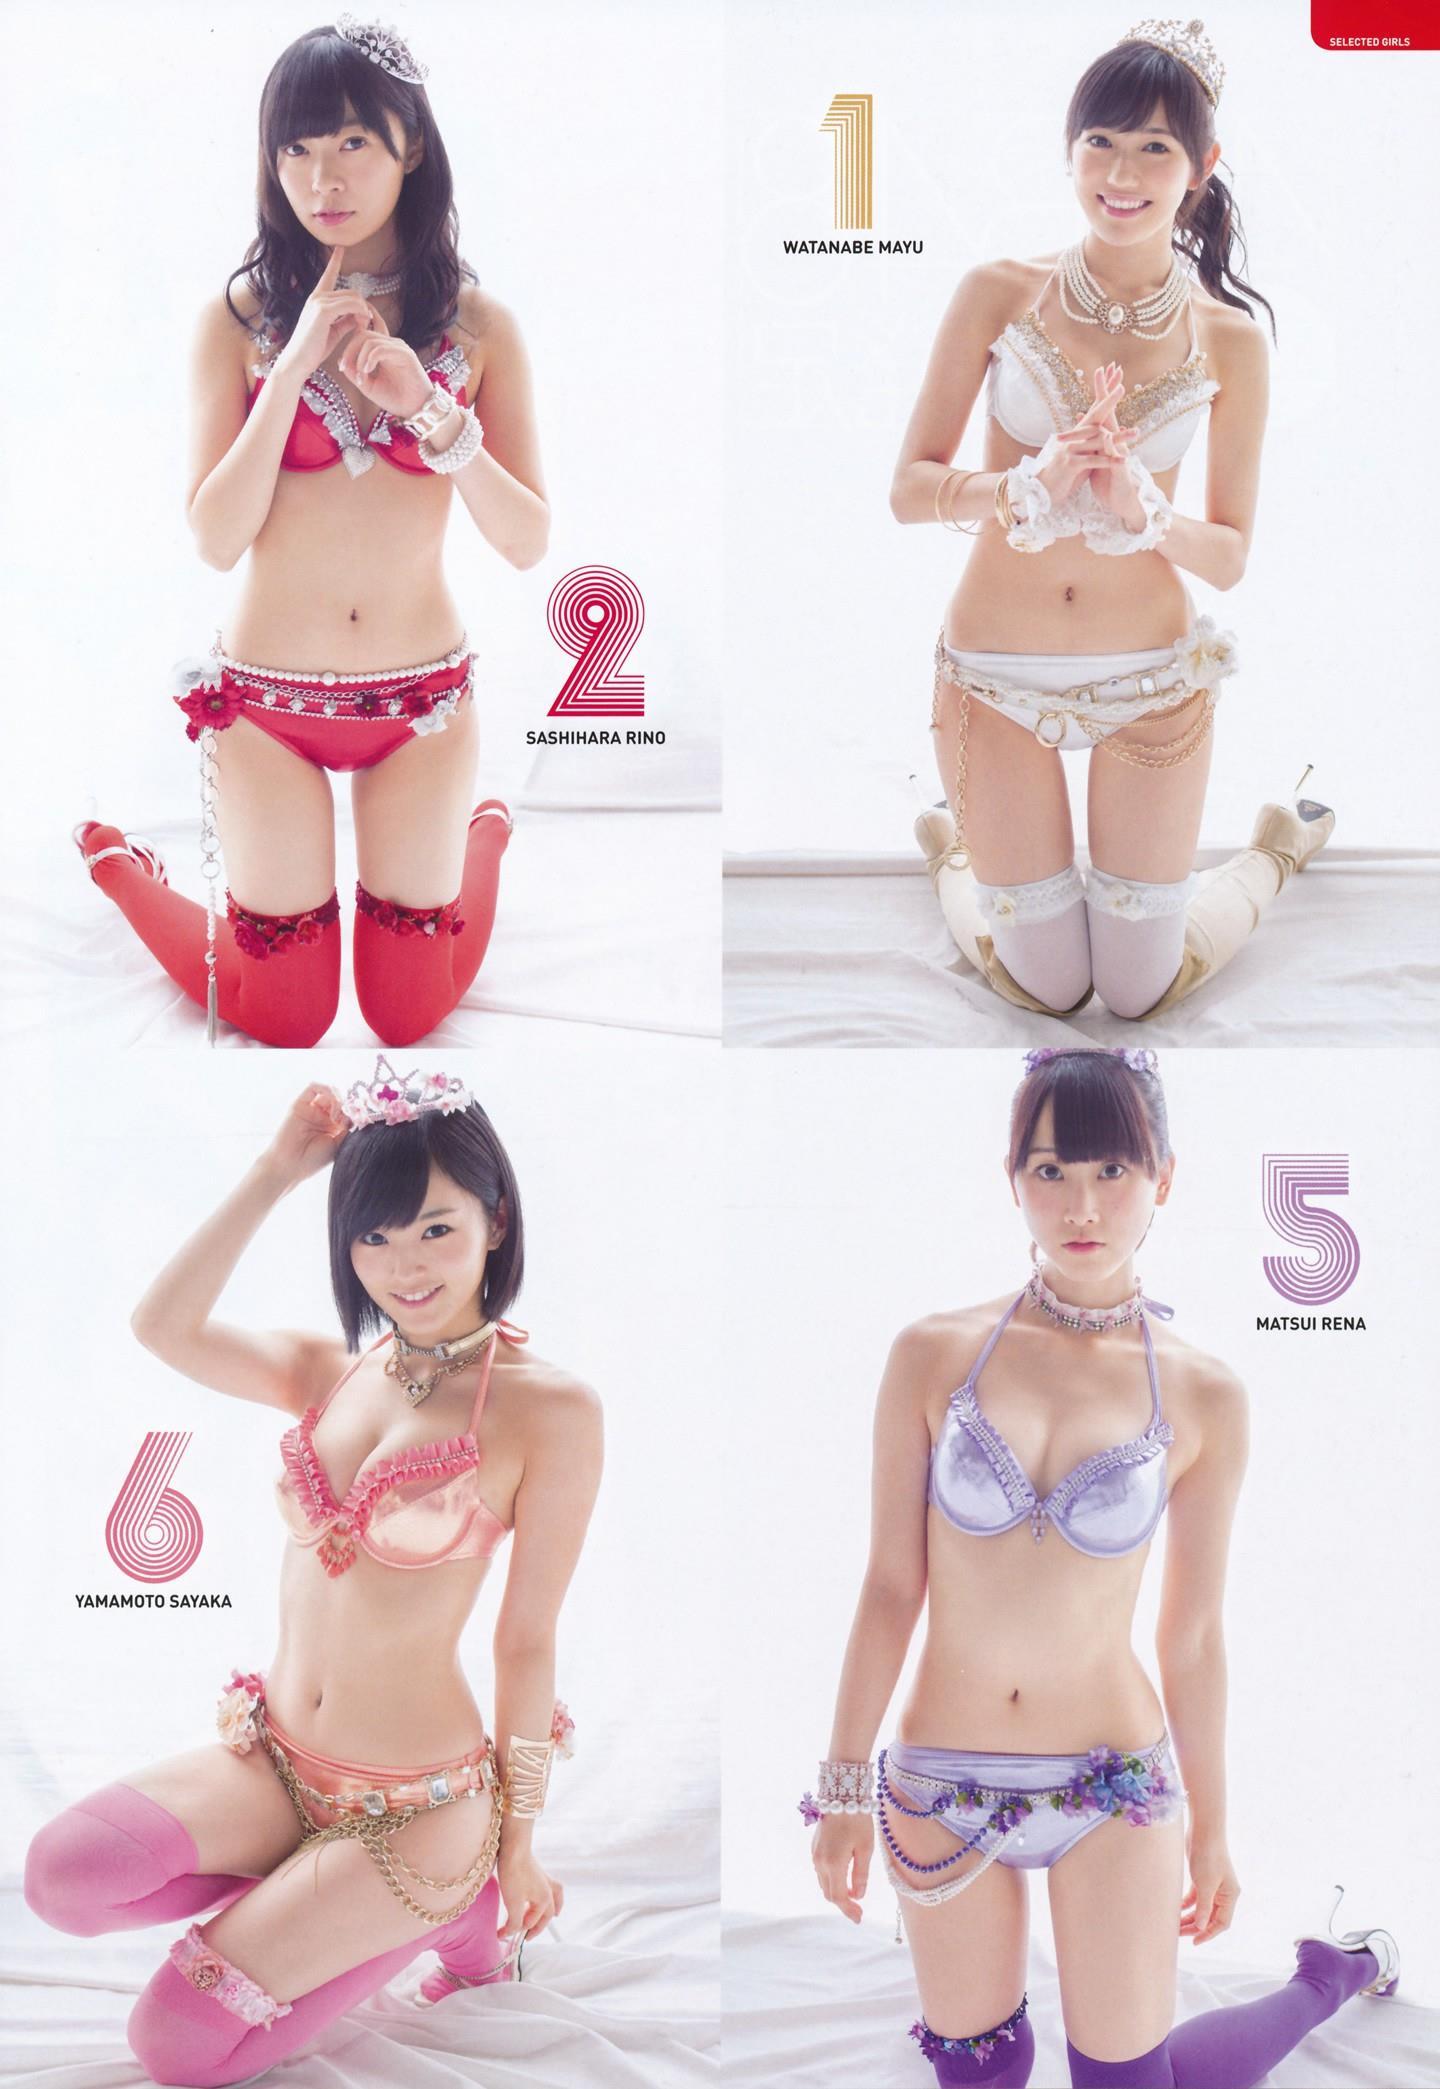 AKB48人気メンバー 画像 4